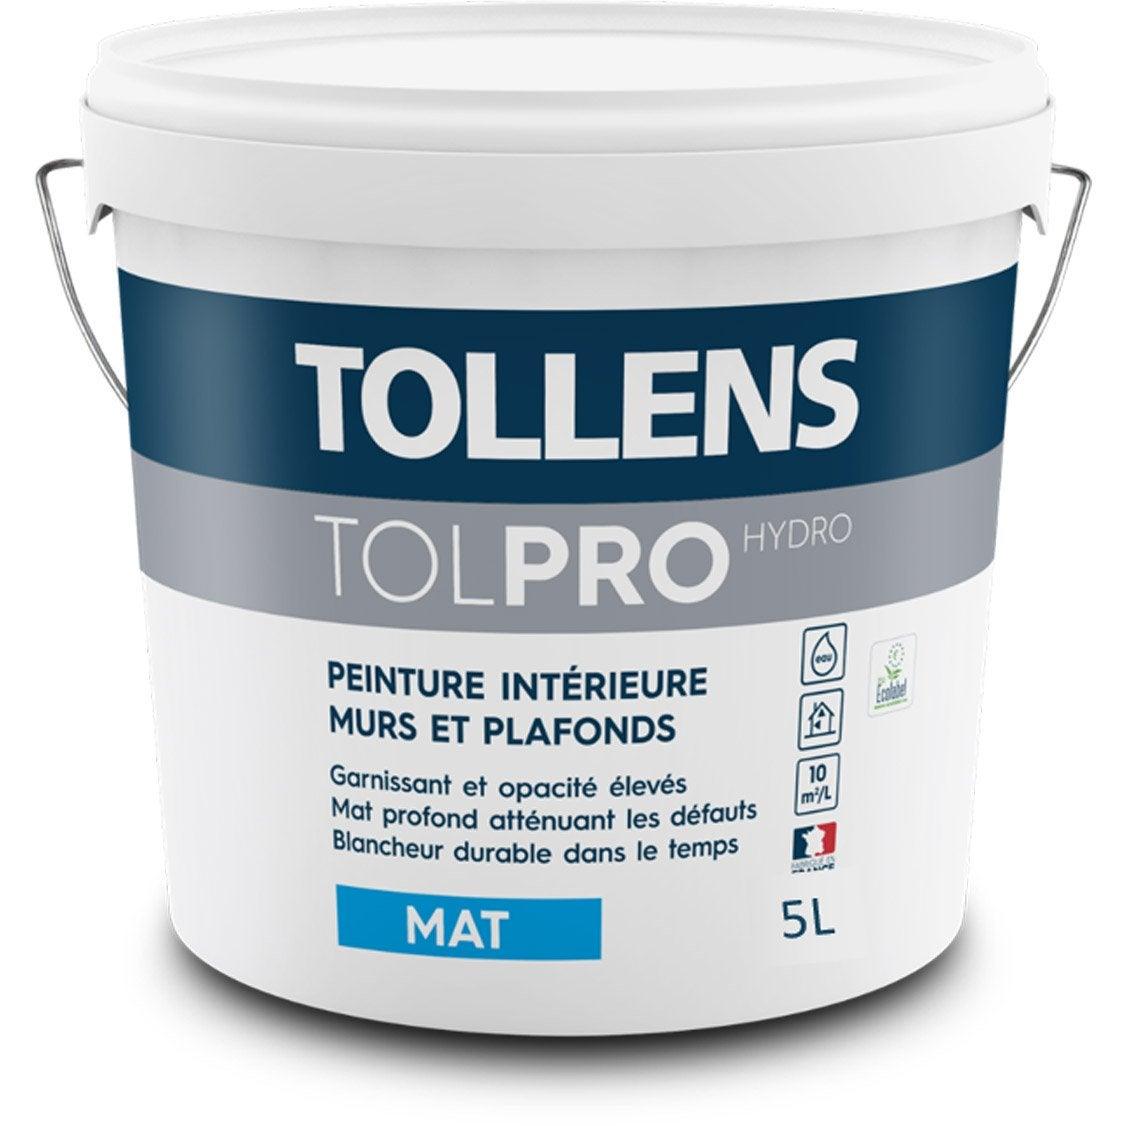 Peinture TOLLENS, mur et plafond Tolpro hydro, blanc, mat ...